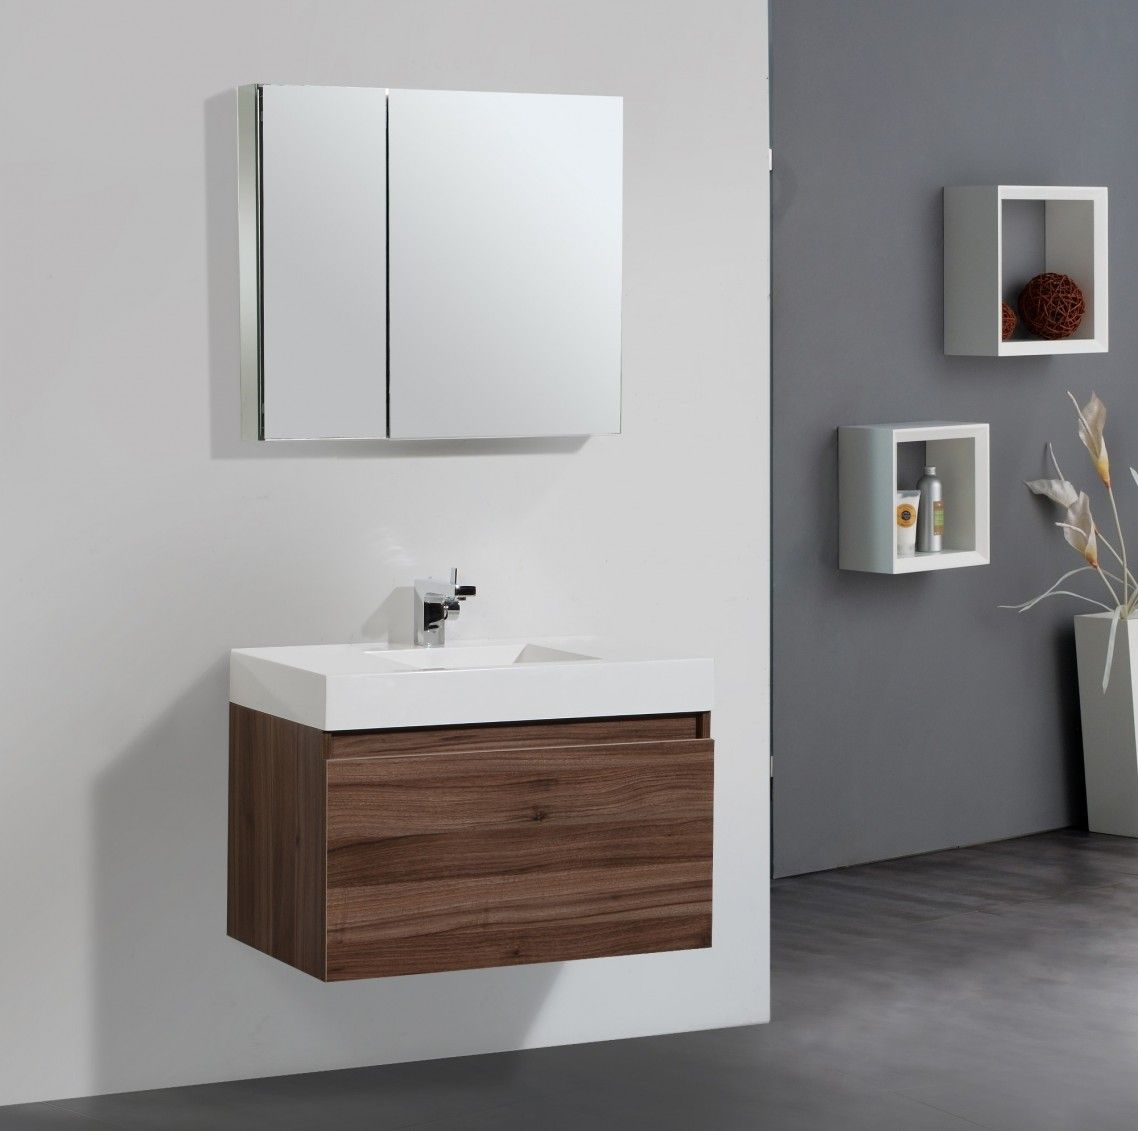 Wood For Bathroom Cabinets Cool Brown Color Panels Like Wood - Floating bathroom sink unit